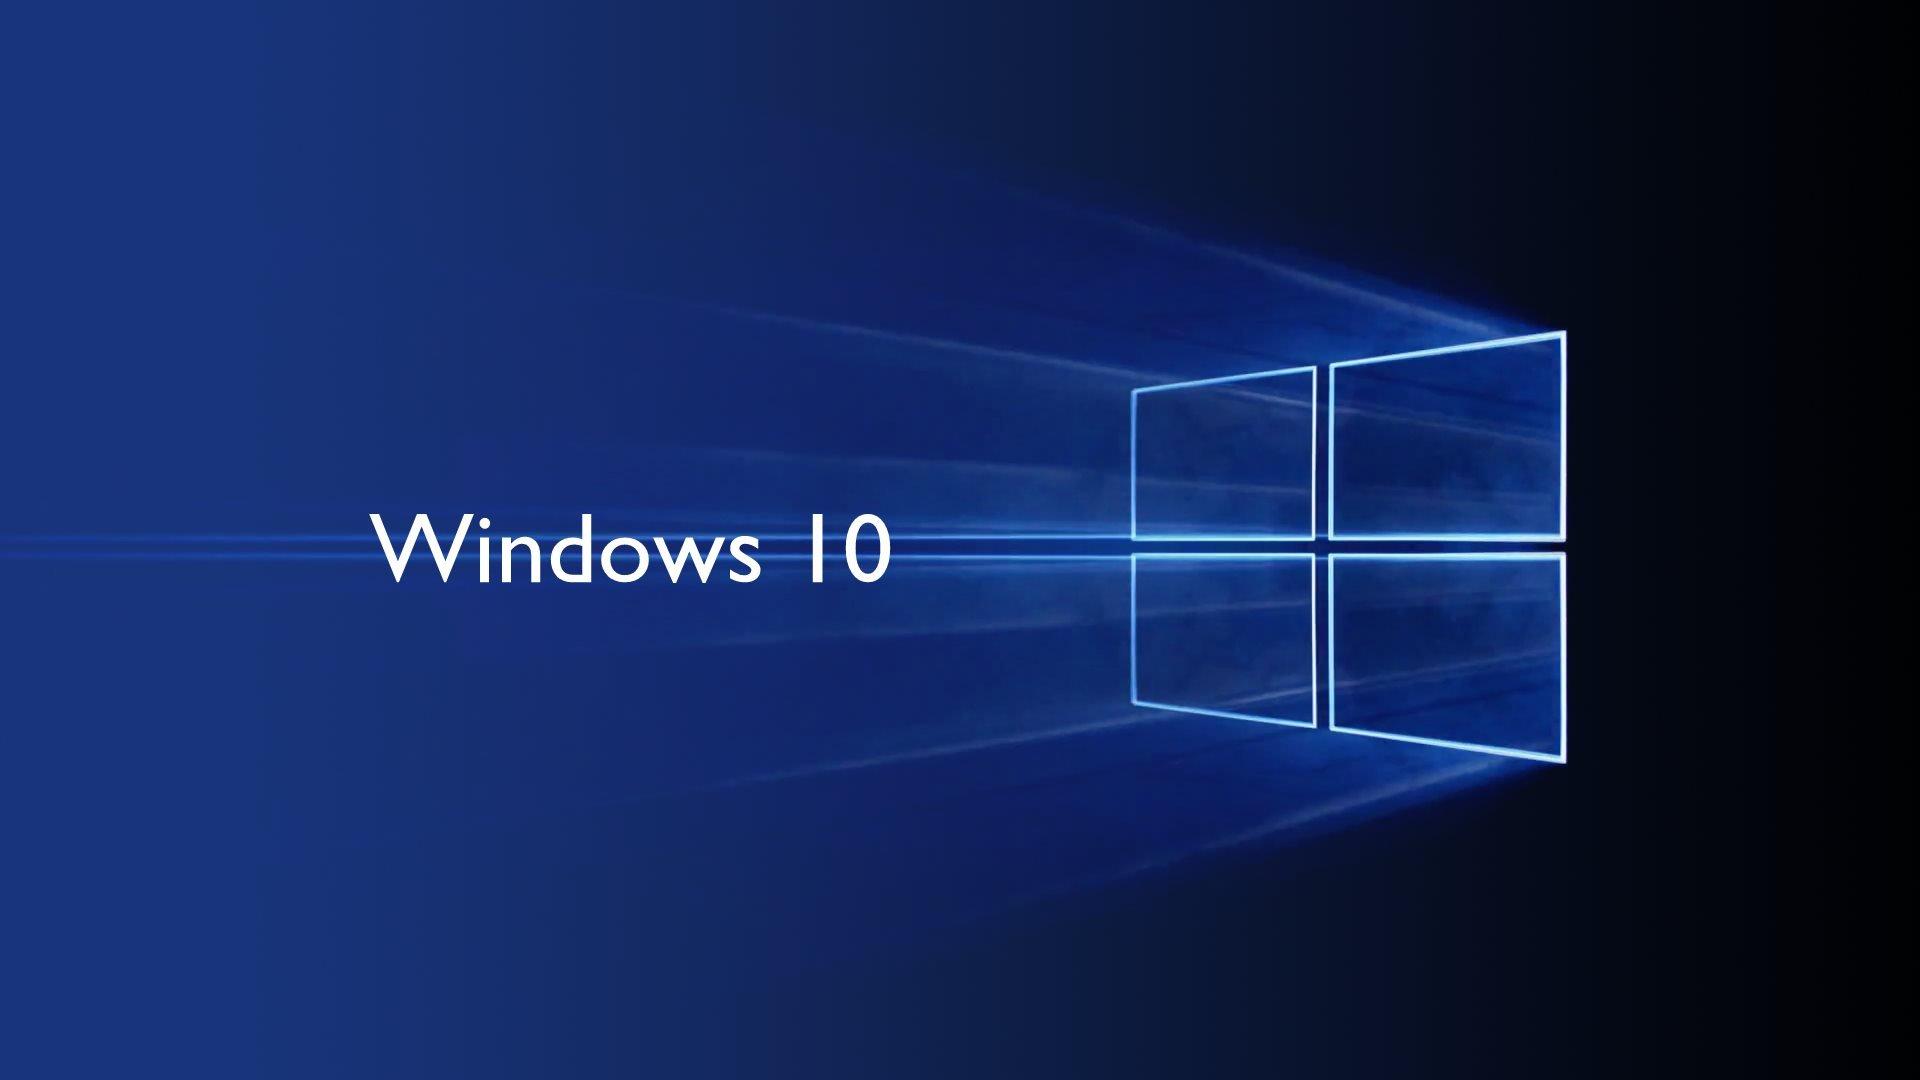 Photo of كيف تعرف نوع و أصدار نسخة نظام تشغيل ويندوز 10 المثبتة لديك